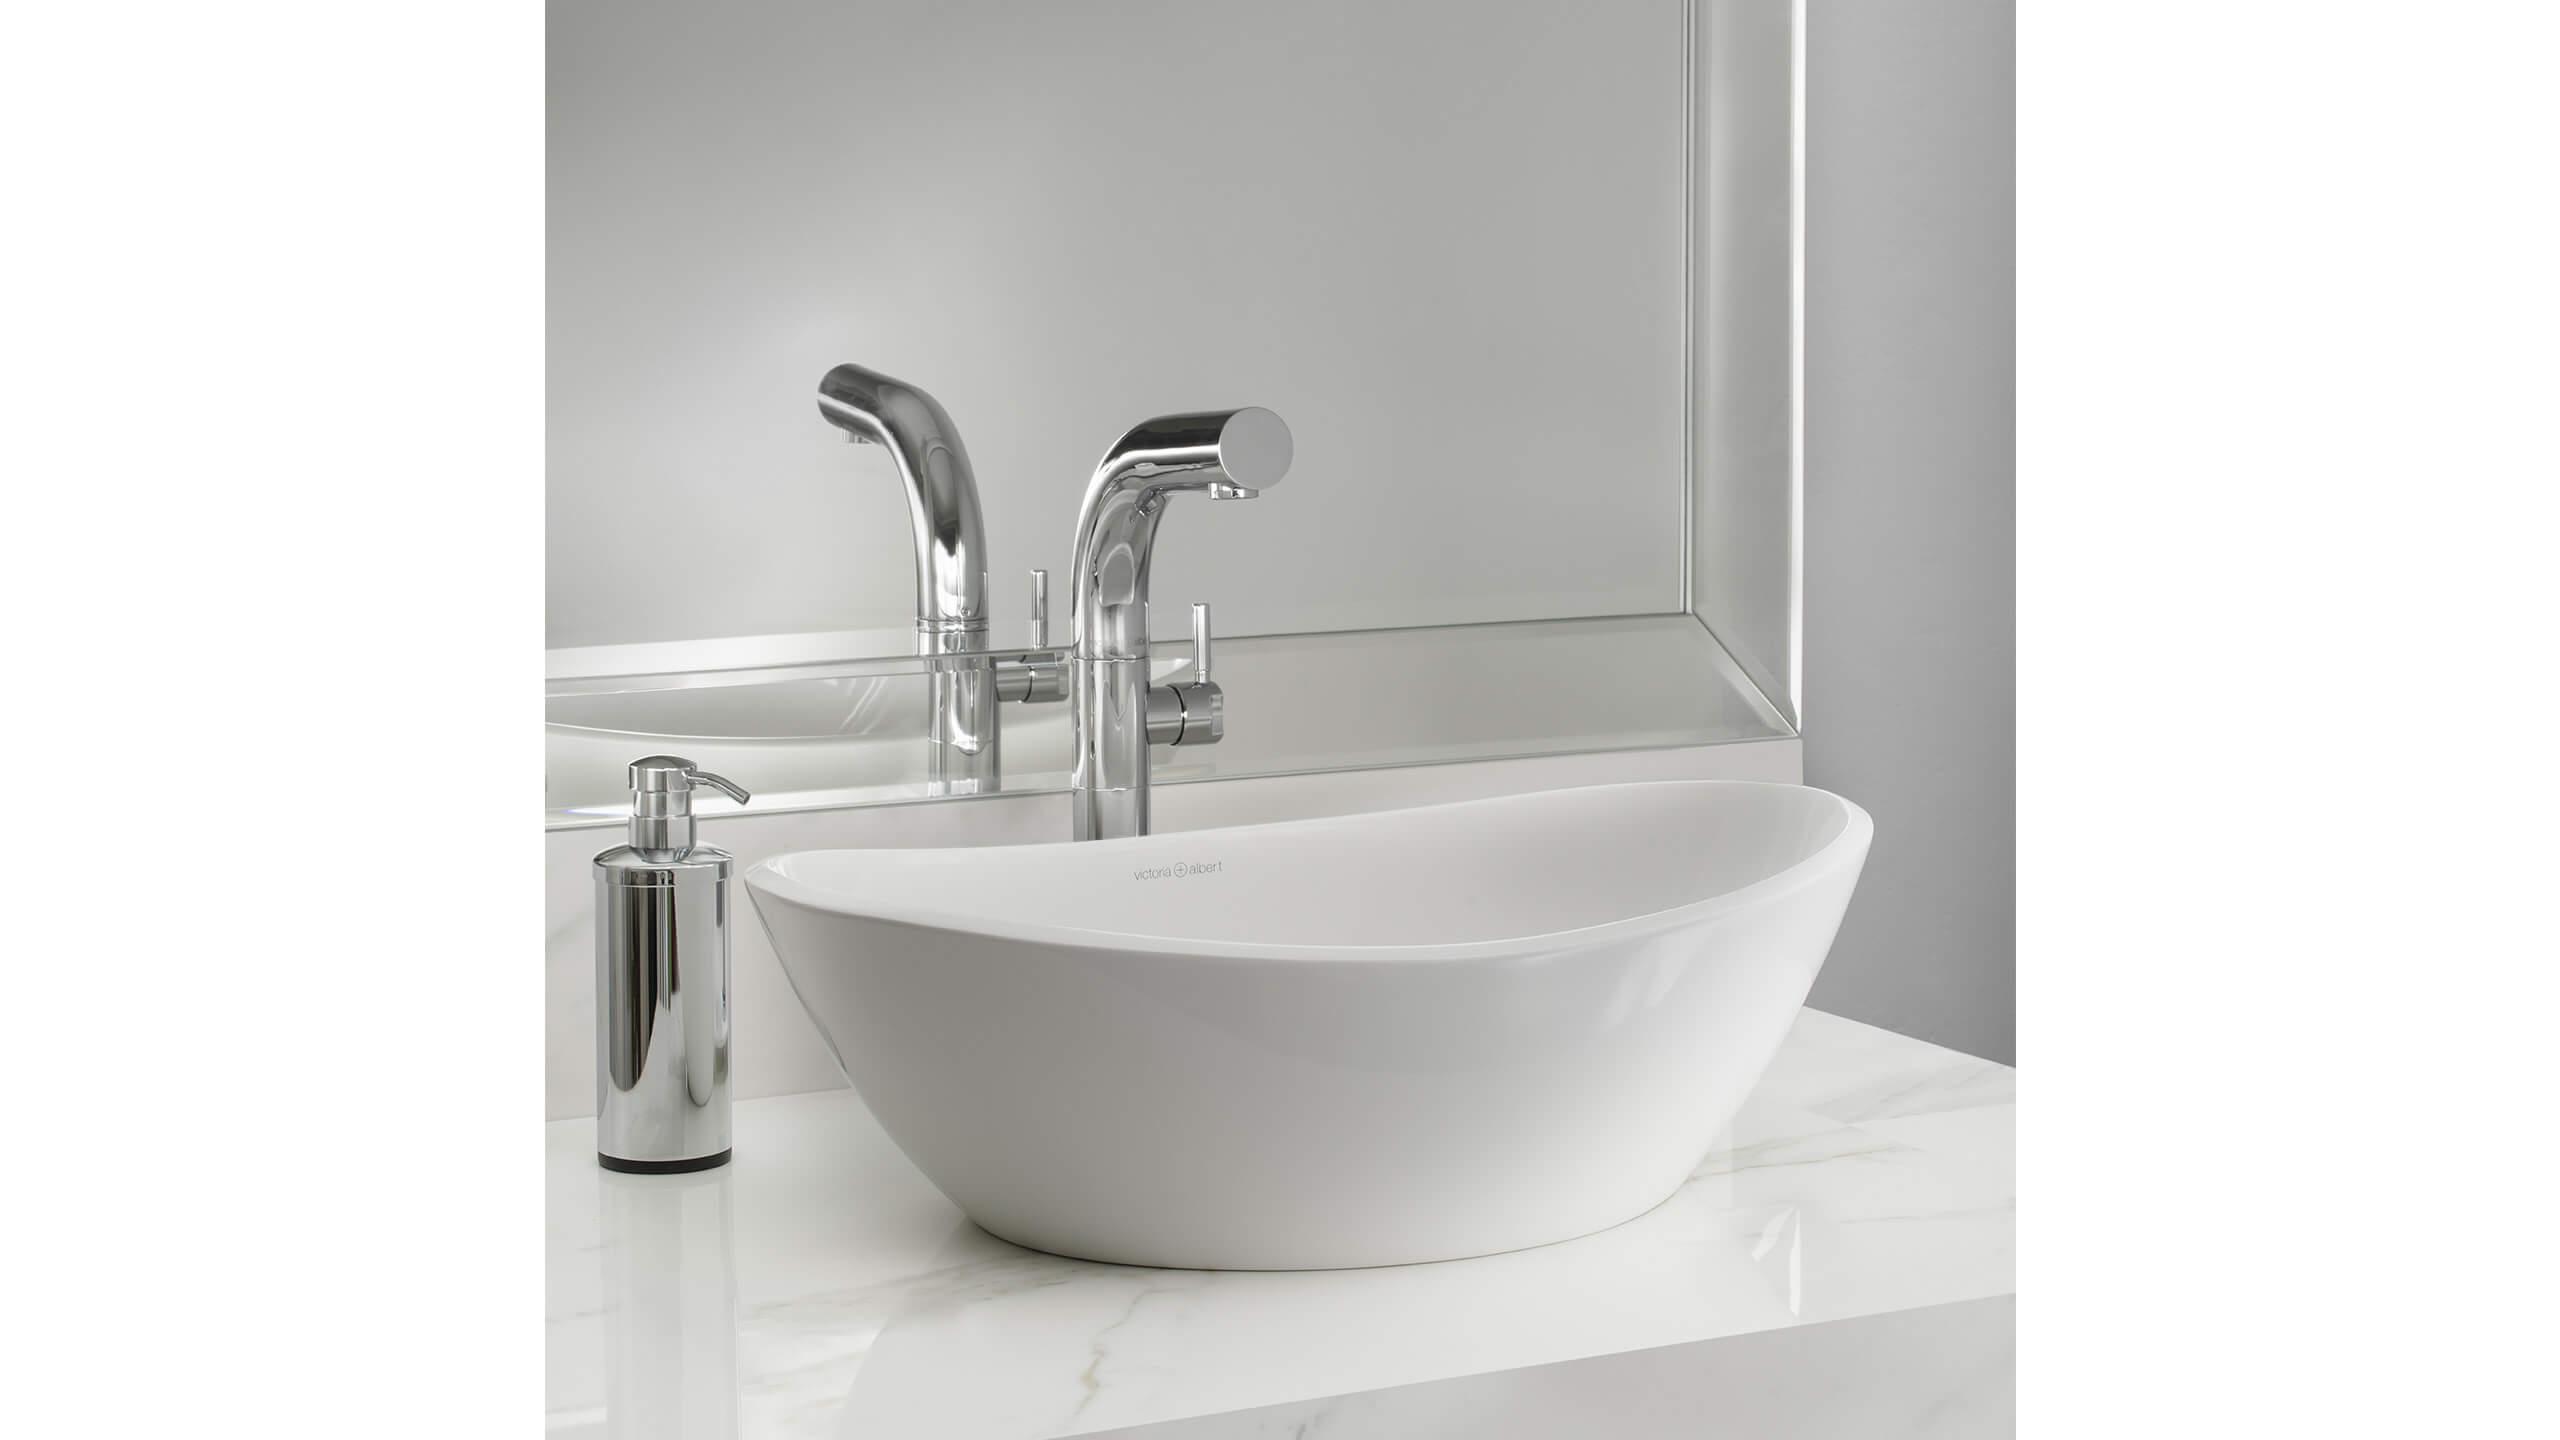 Amalfi 55 lavabo de ba o victoria albert estudio - Lavabo para bano ...